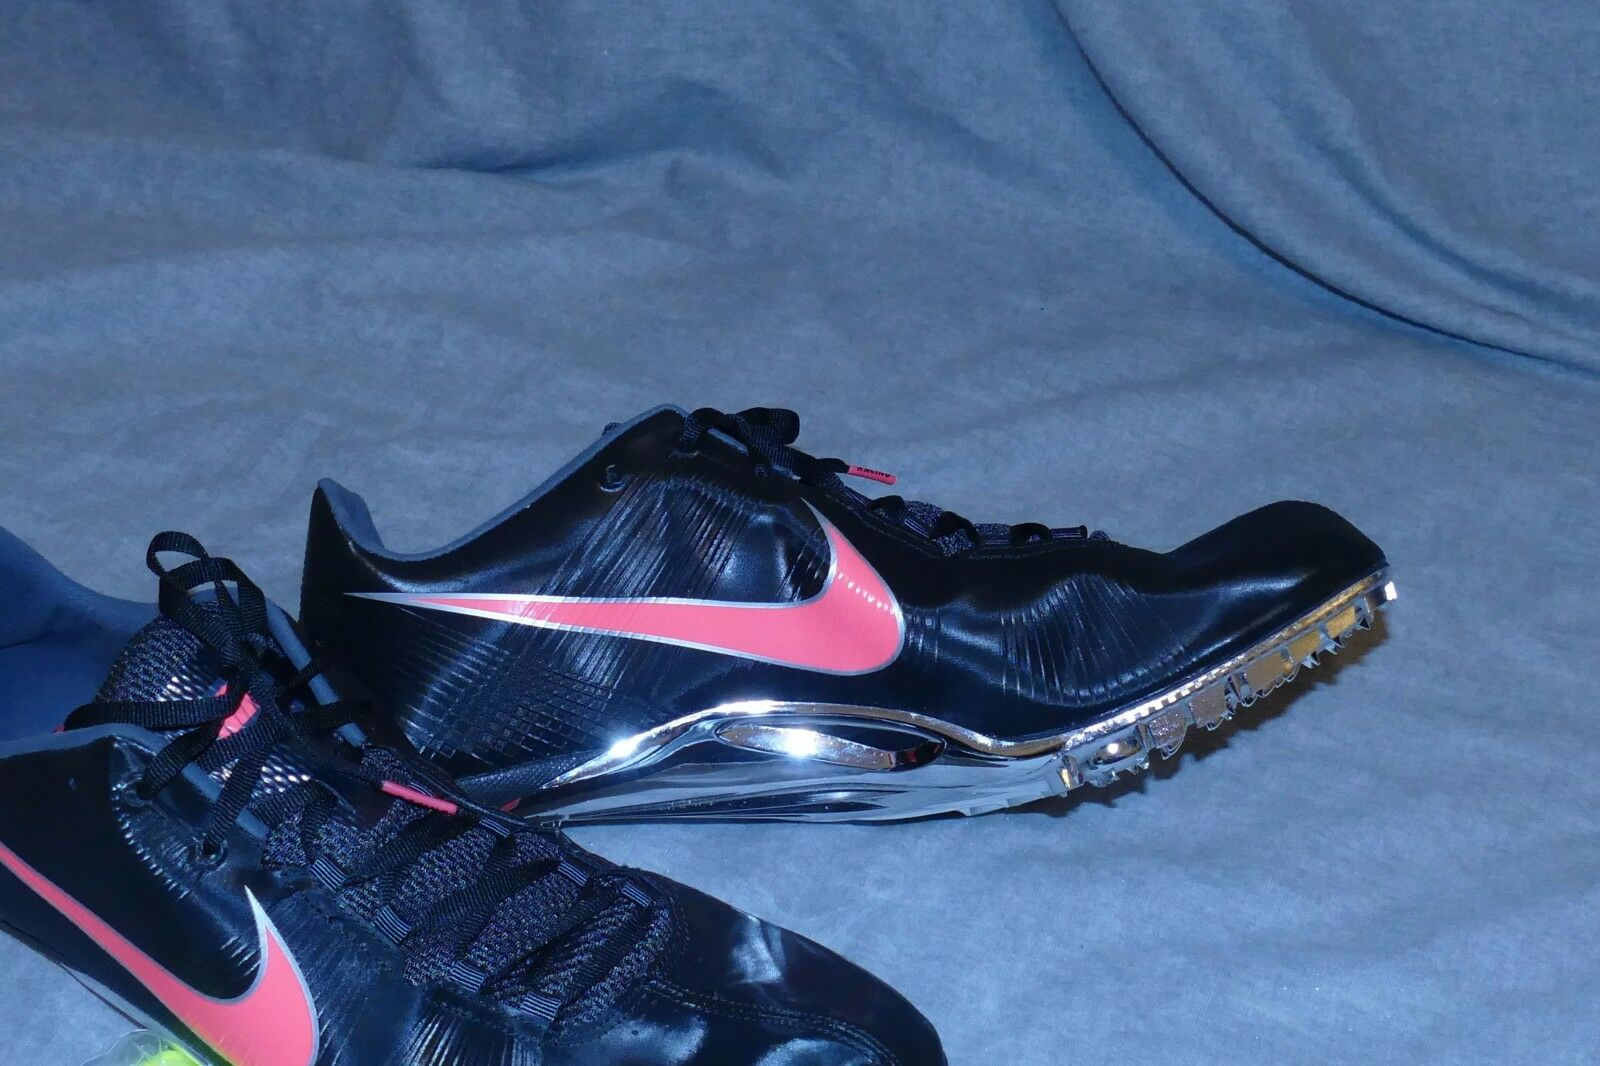 NIKE ZOOM JA FLY Track Running Shoe w/ Spikes 487624 061 Sz 15 Black/Crimson Seasonal clearance sale